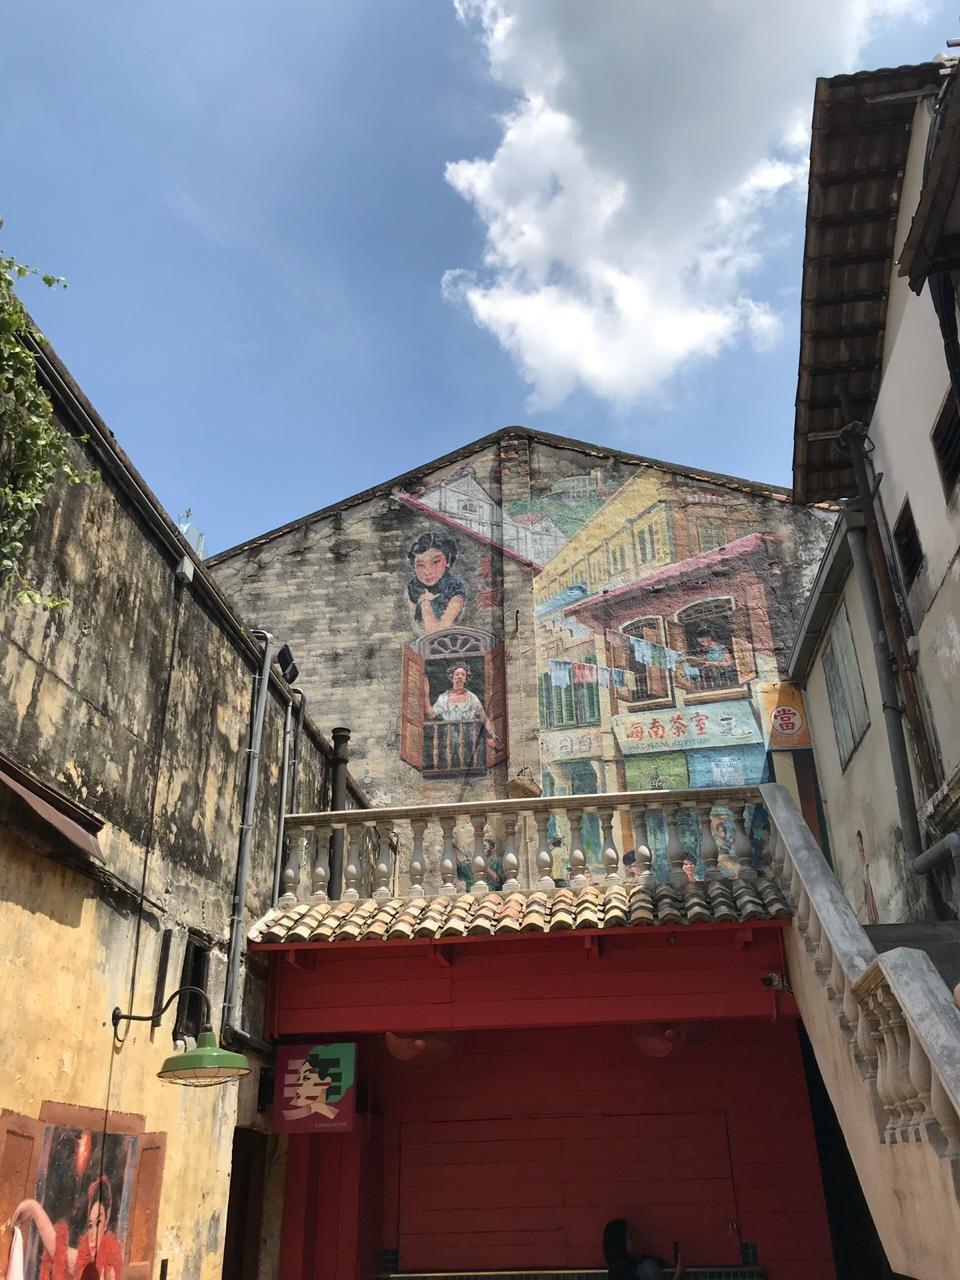 Restored chinatown lane at Kwan Chai Hong, Petaling street in China town.